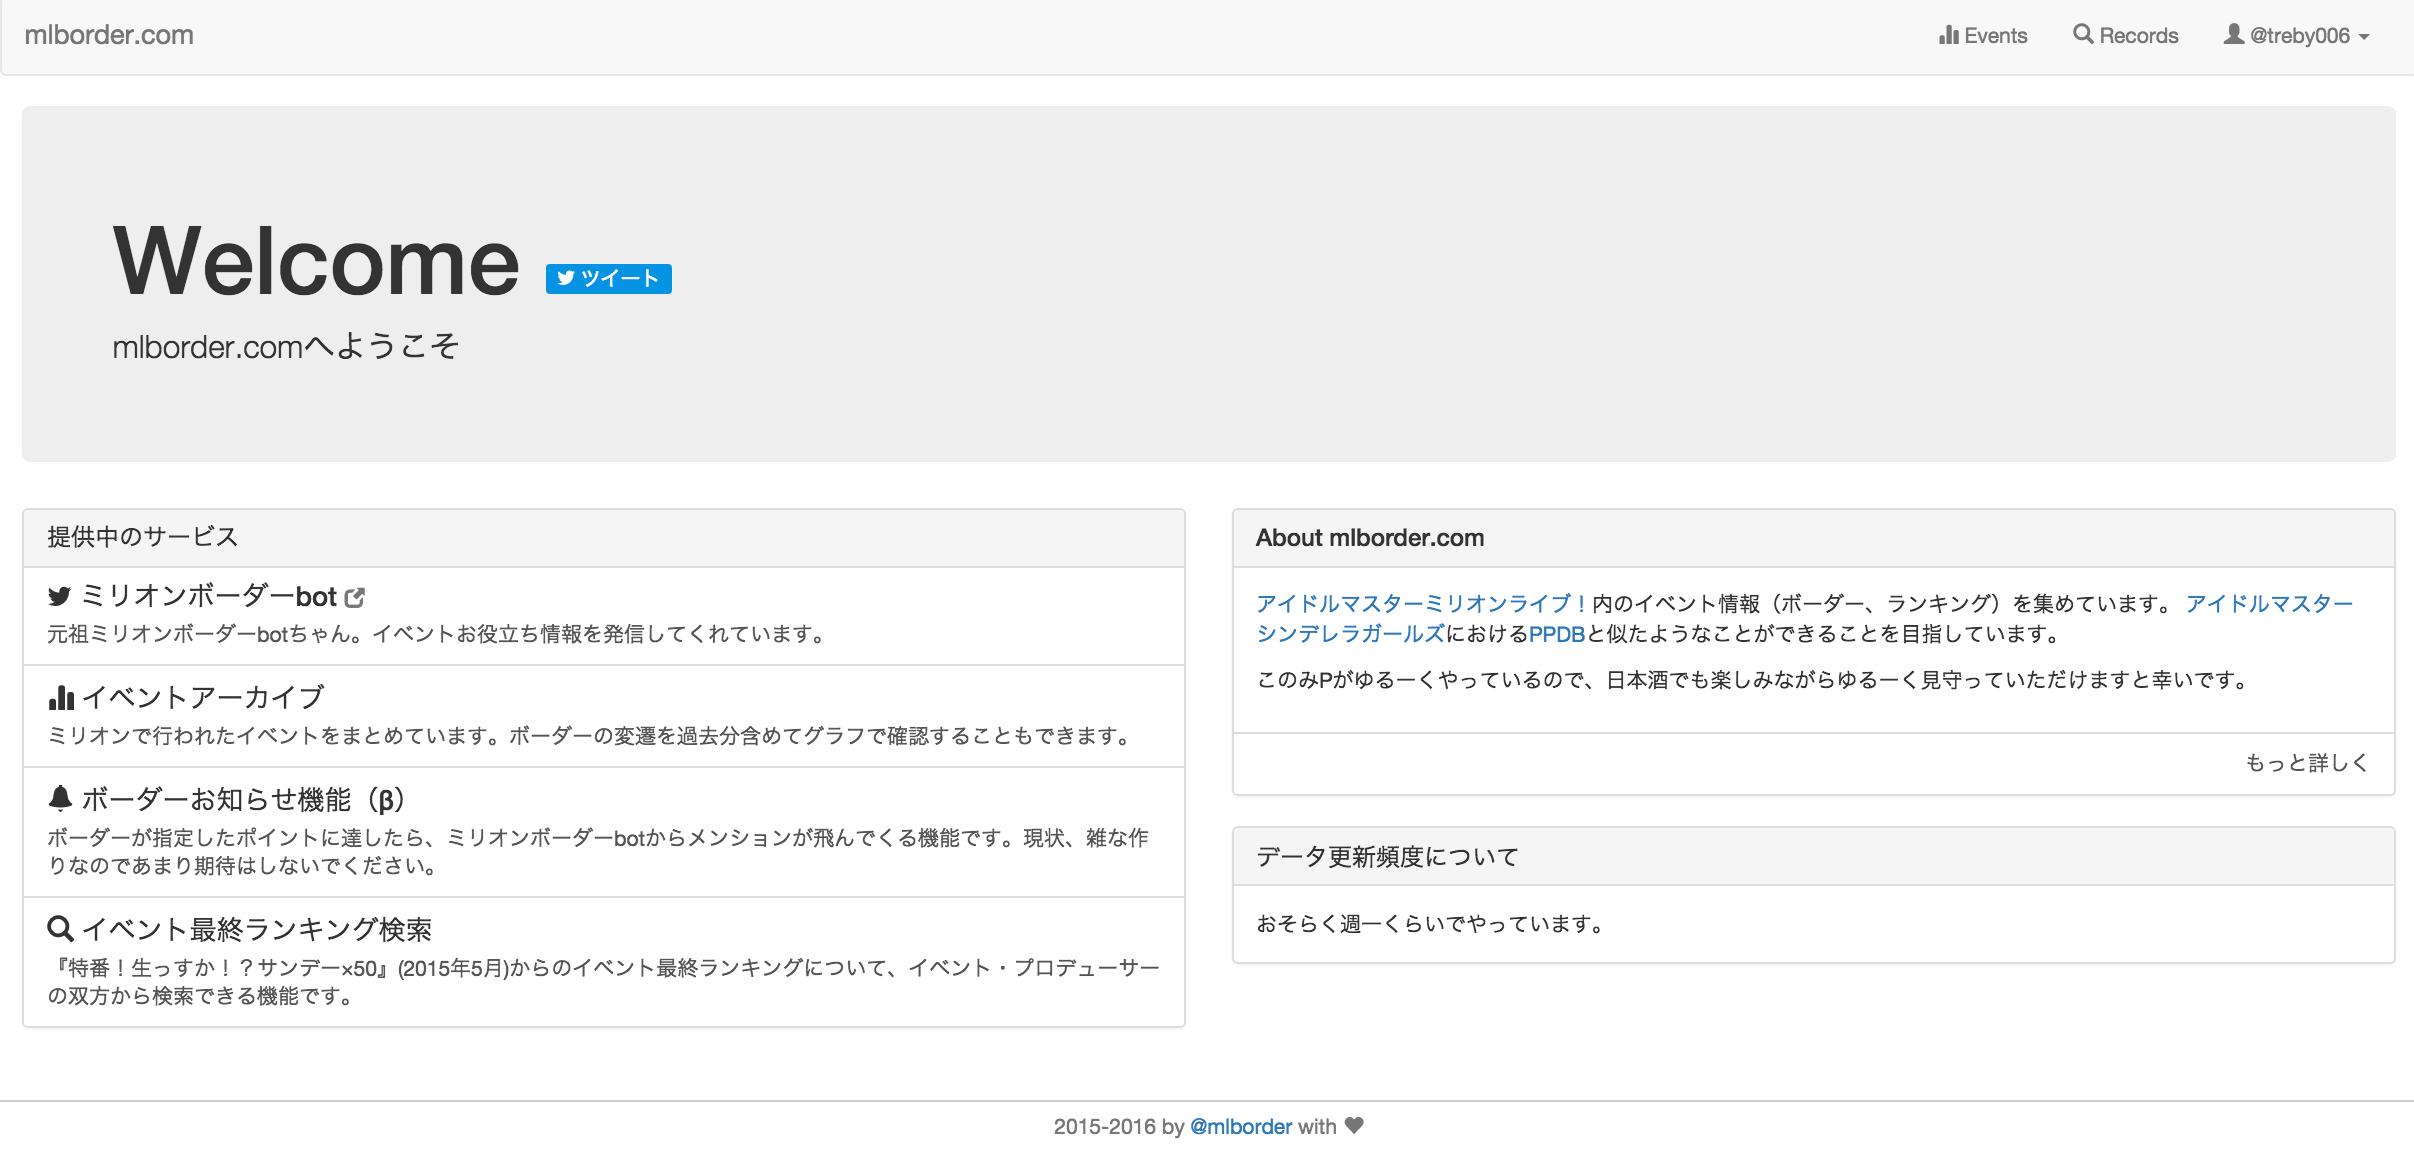 mlborder.com